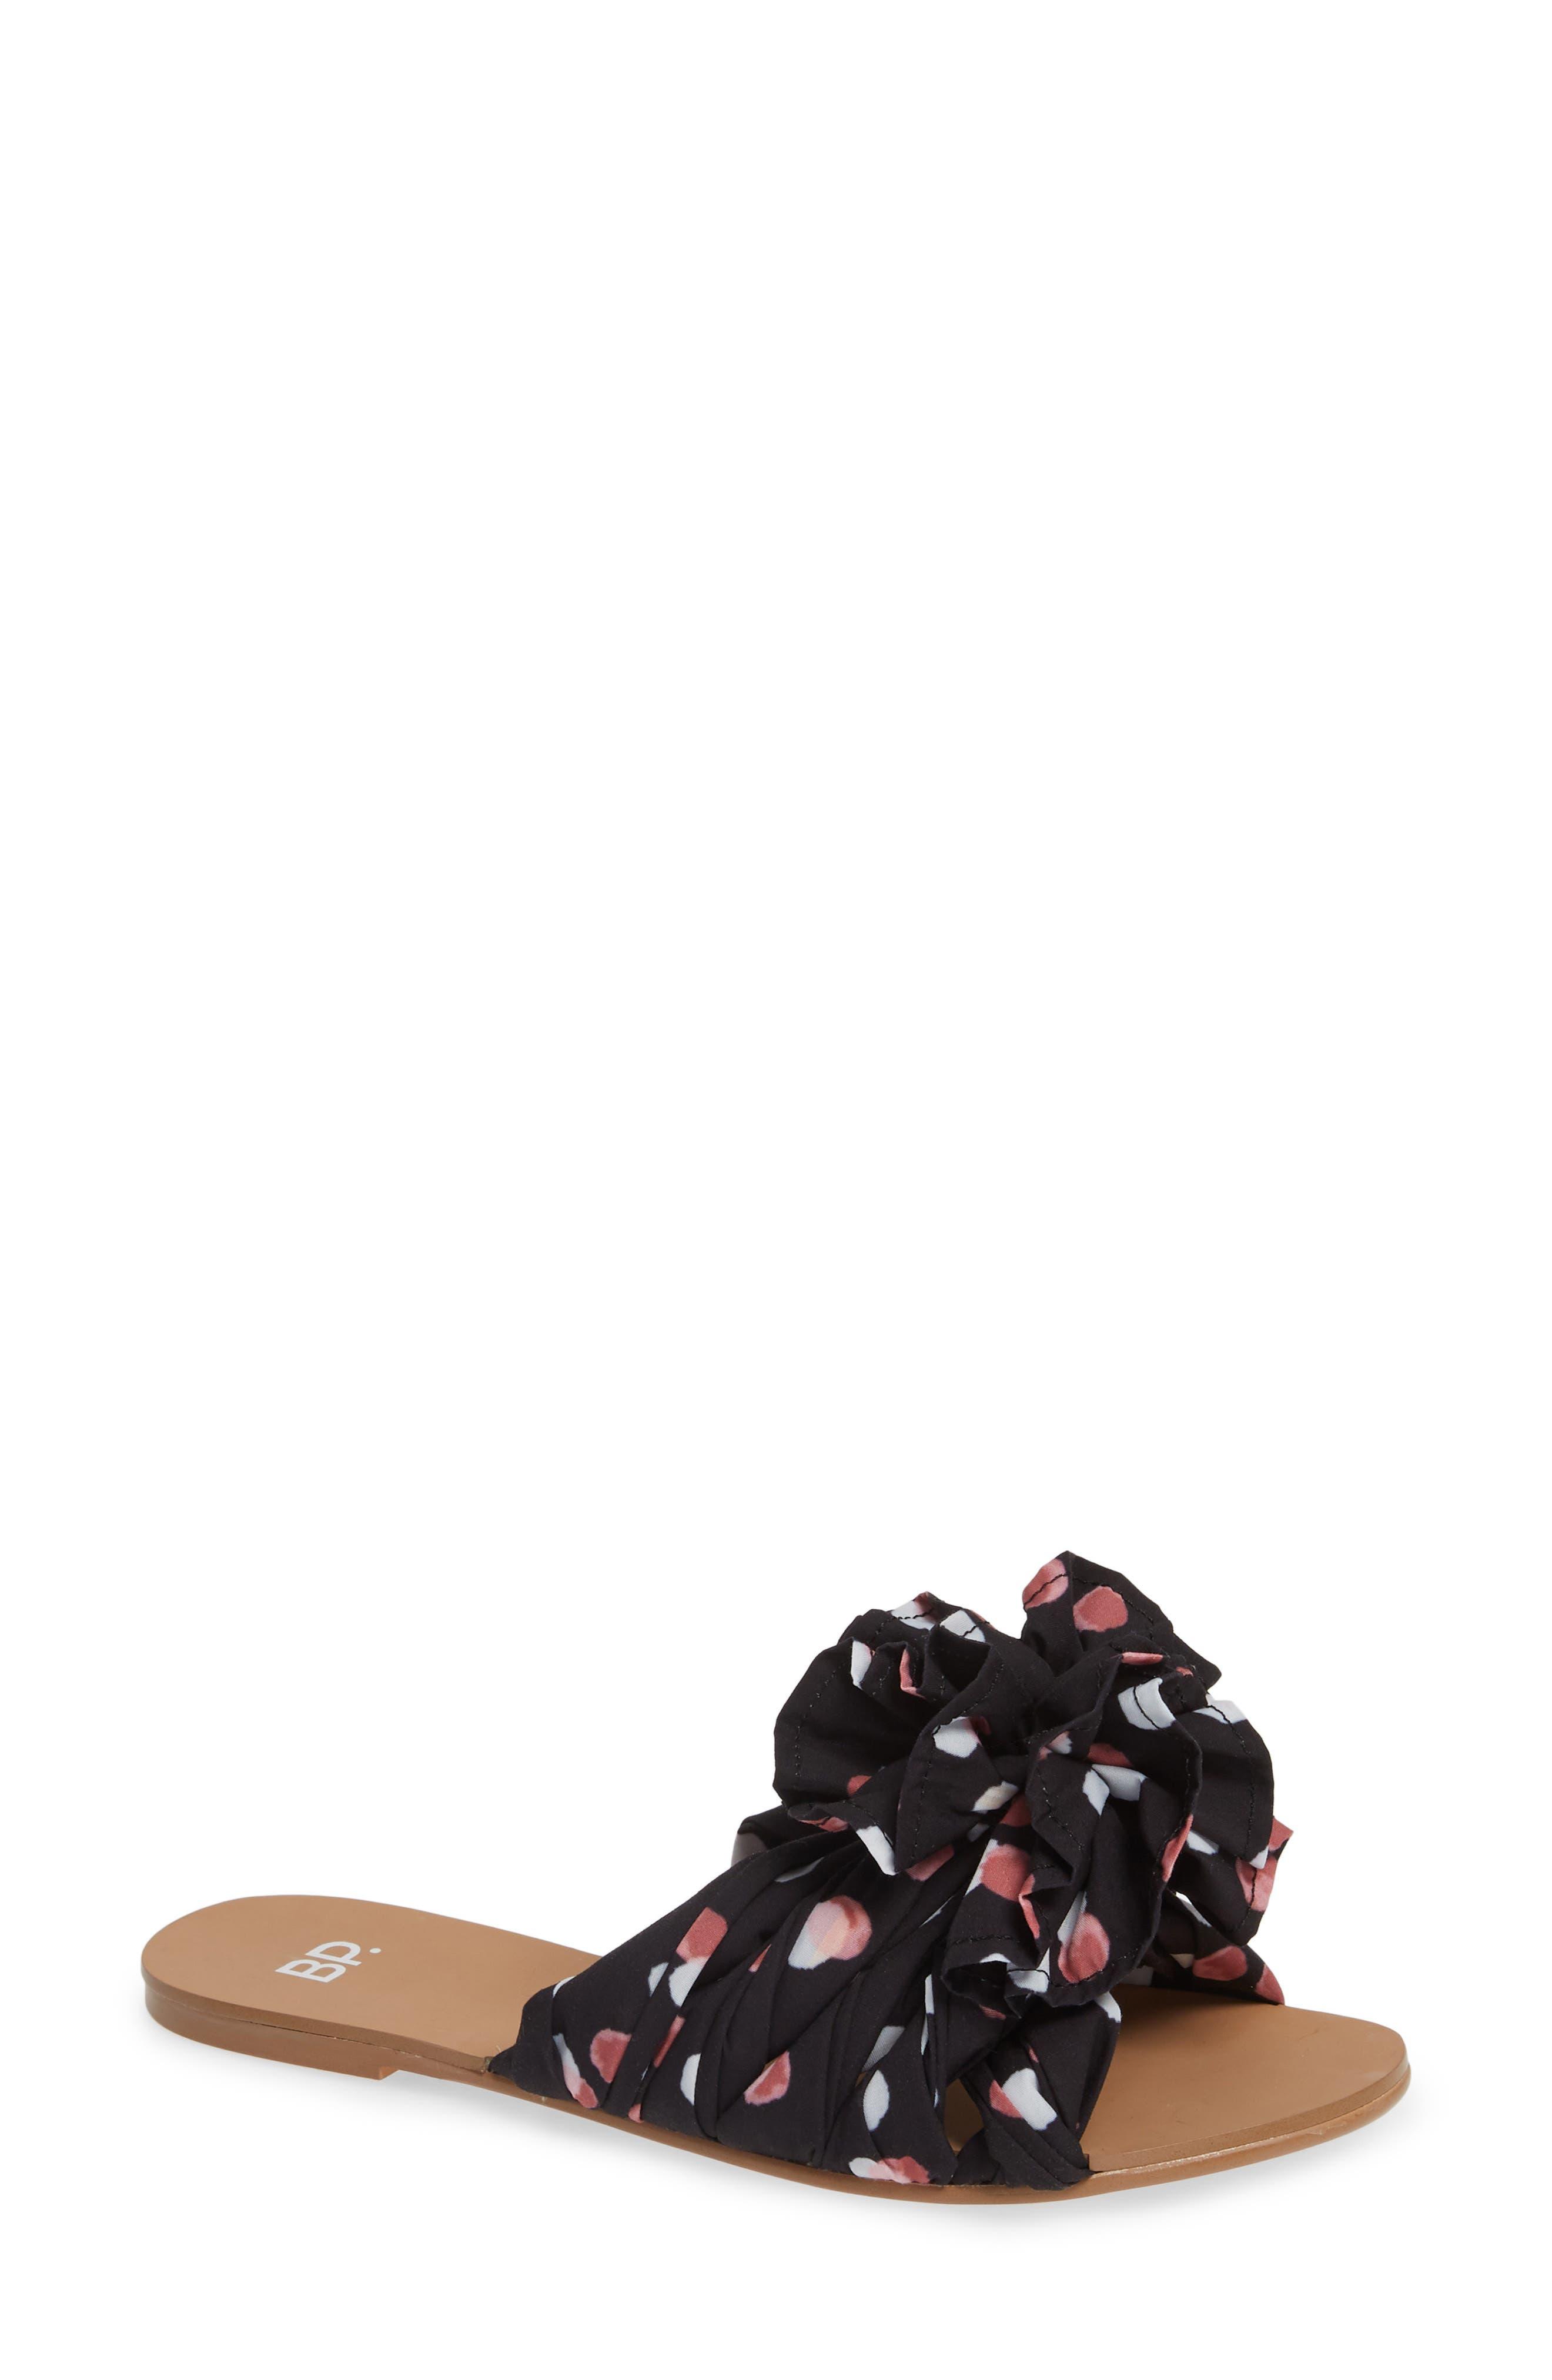 BP. Ruby Slide Sandal, Main, color, BLACK POLKA DOT FABRIC